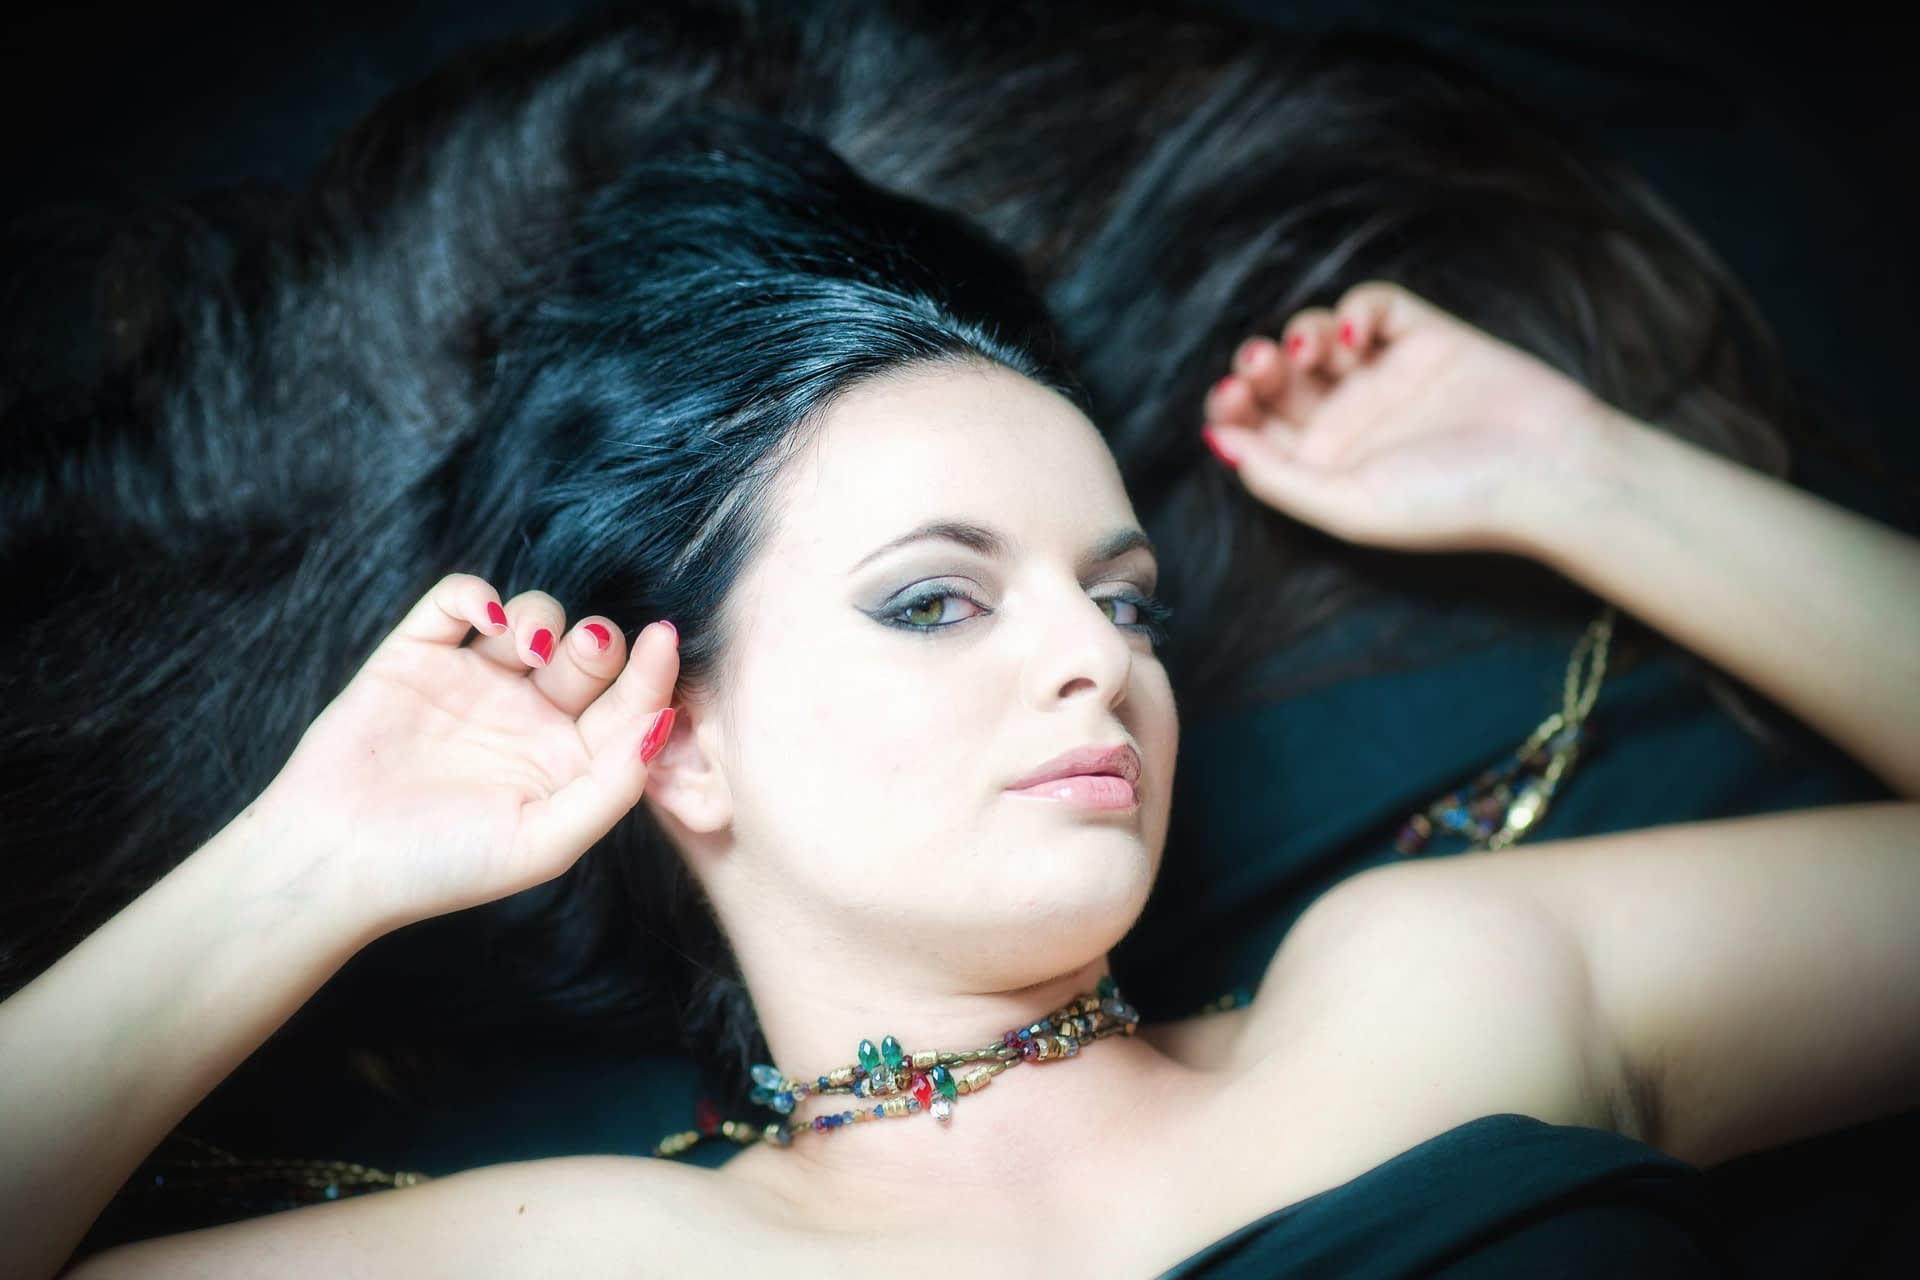 Pieluigi Cavarra - Valentina Blanca 2013 - A99 - 09-Modifica